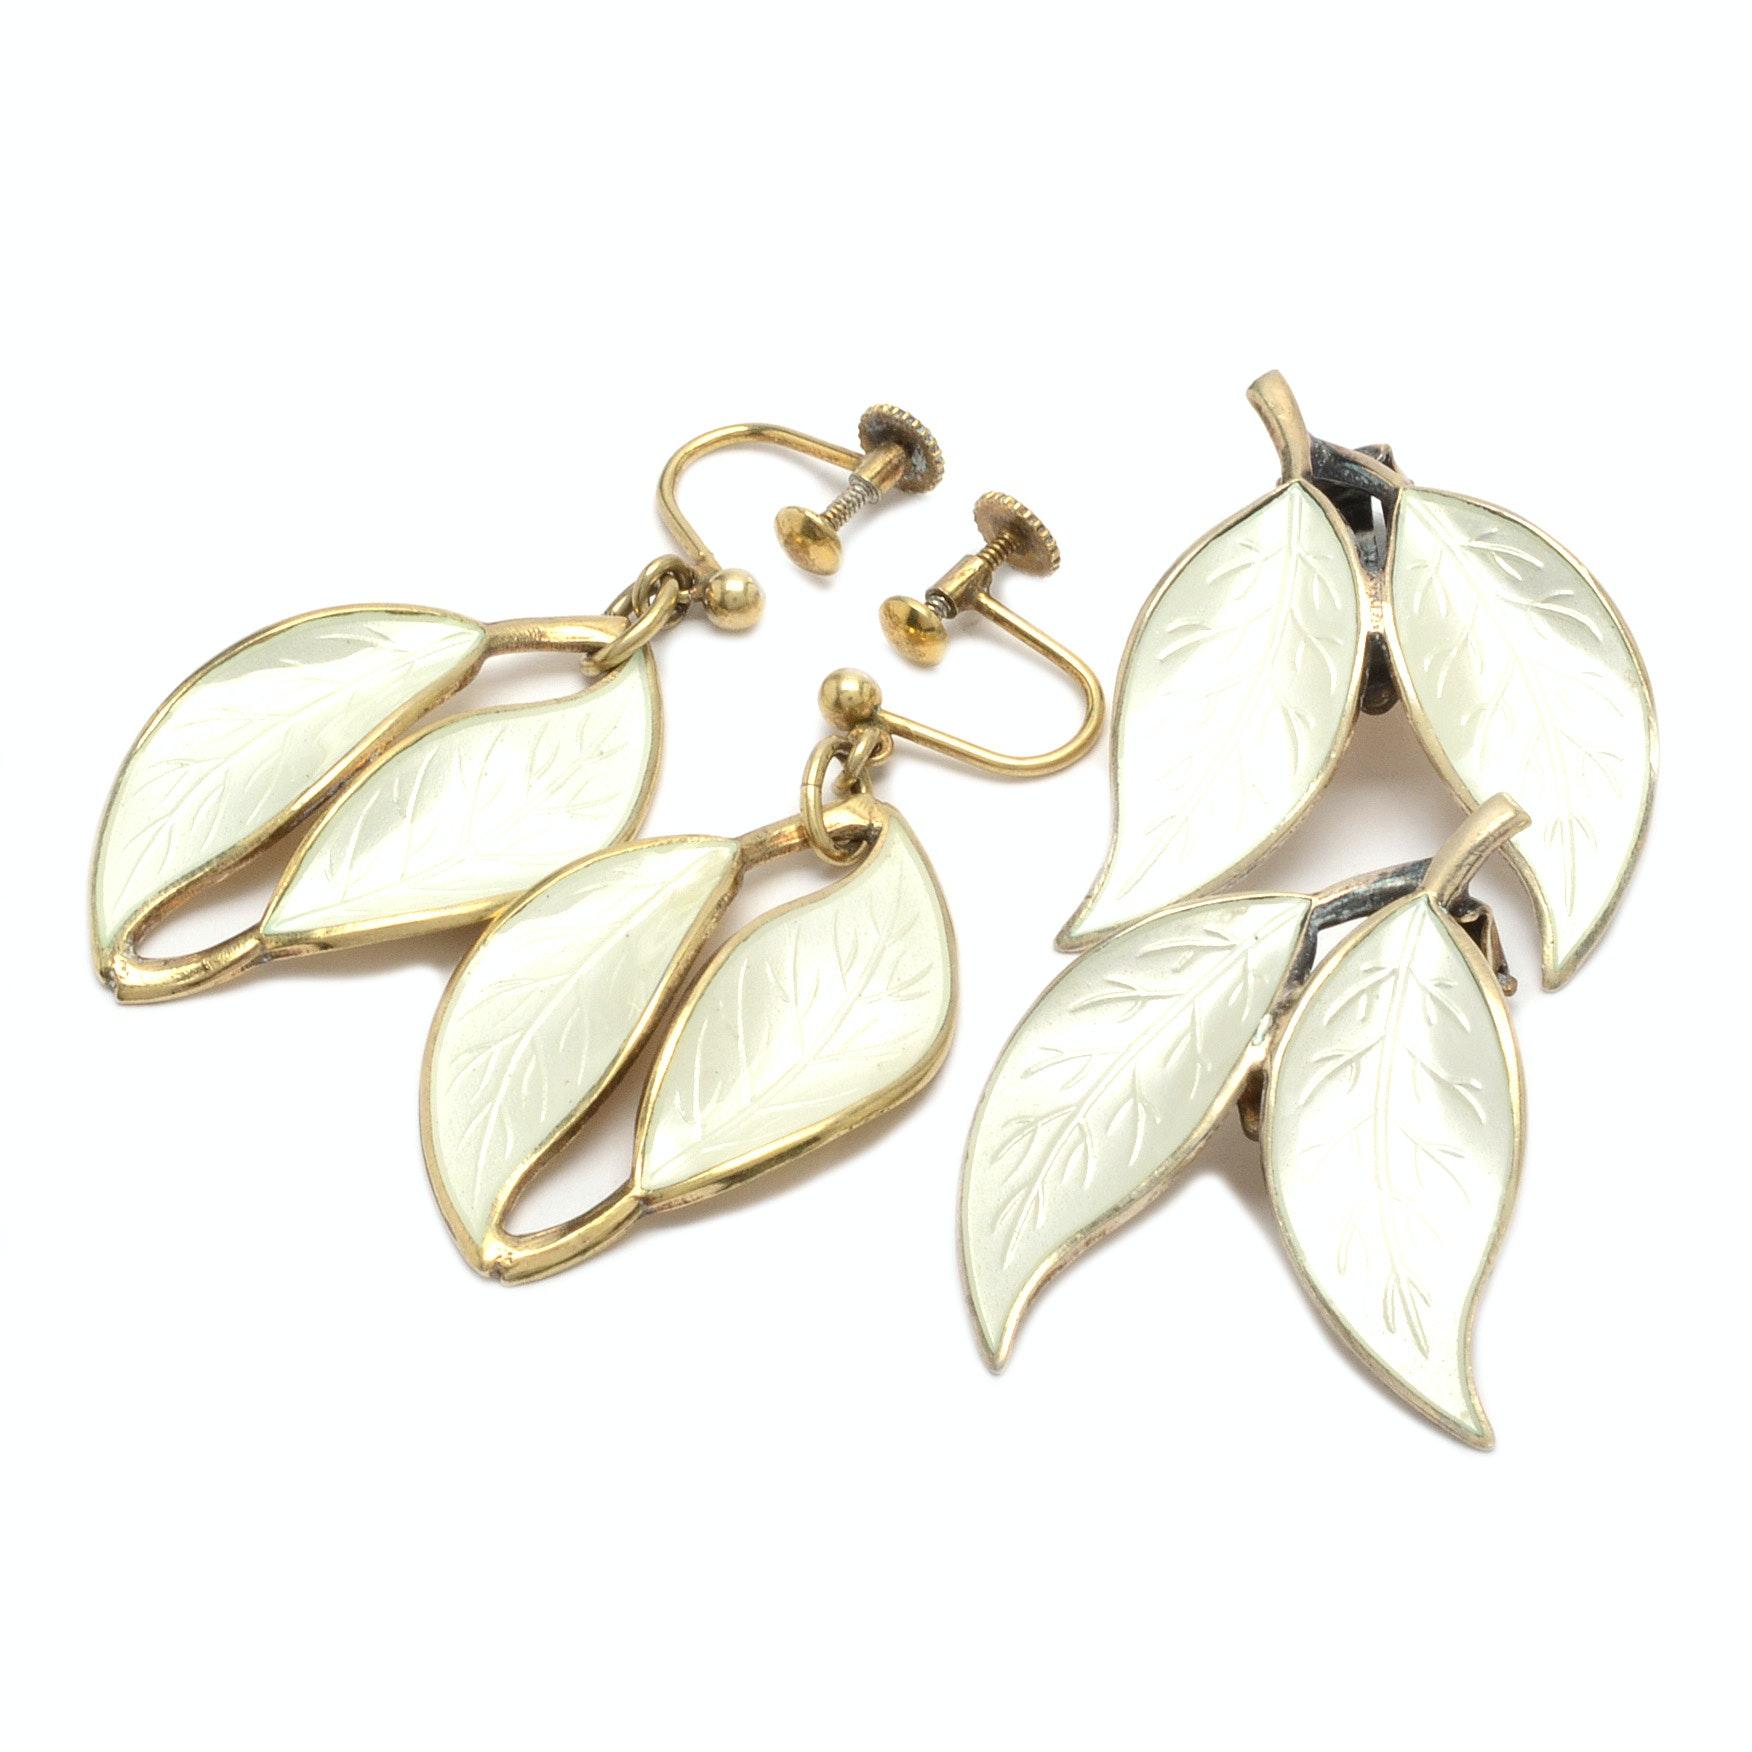 David Andersen Sterling Silver Enamel Leaf Earrings